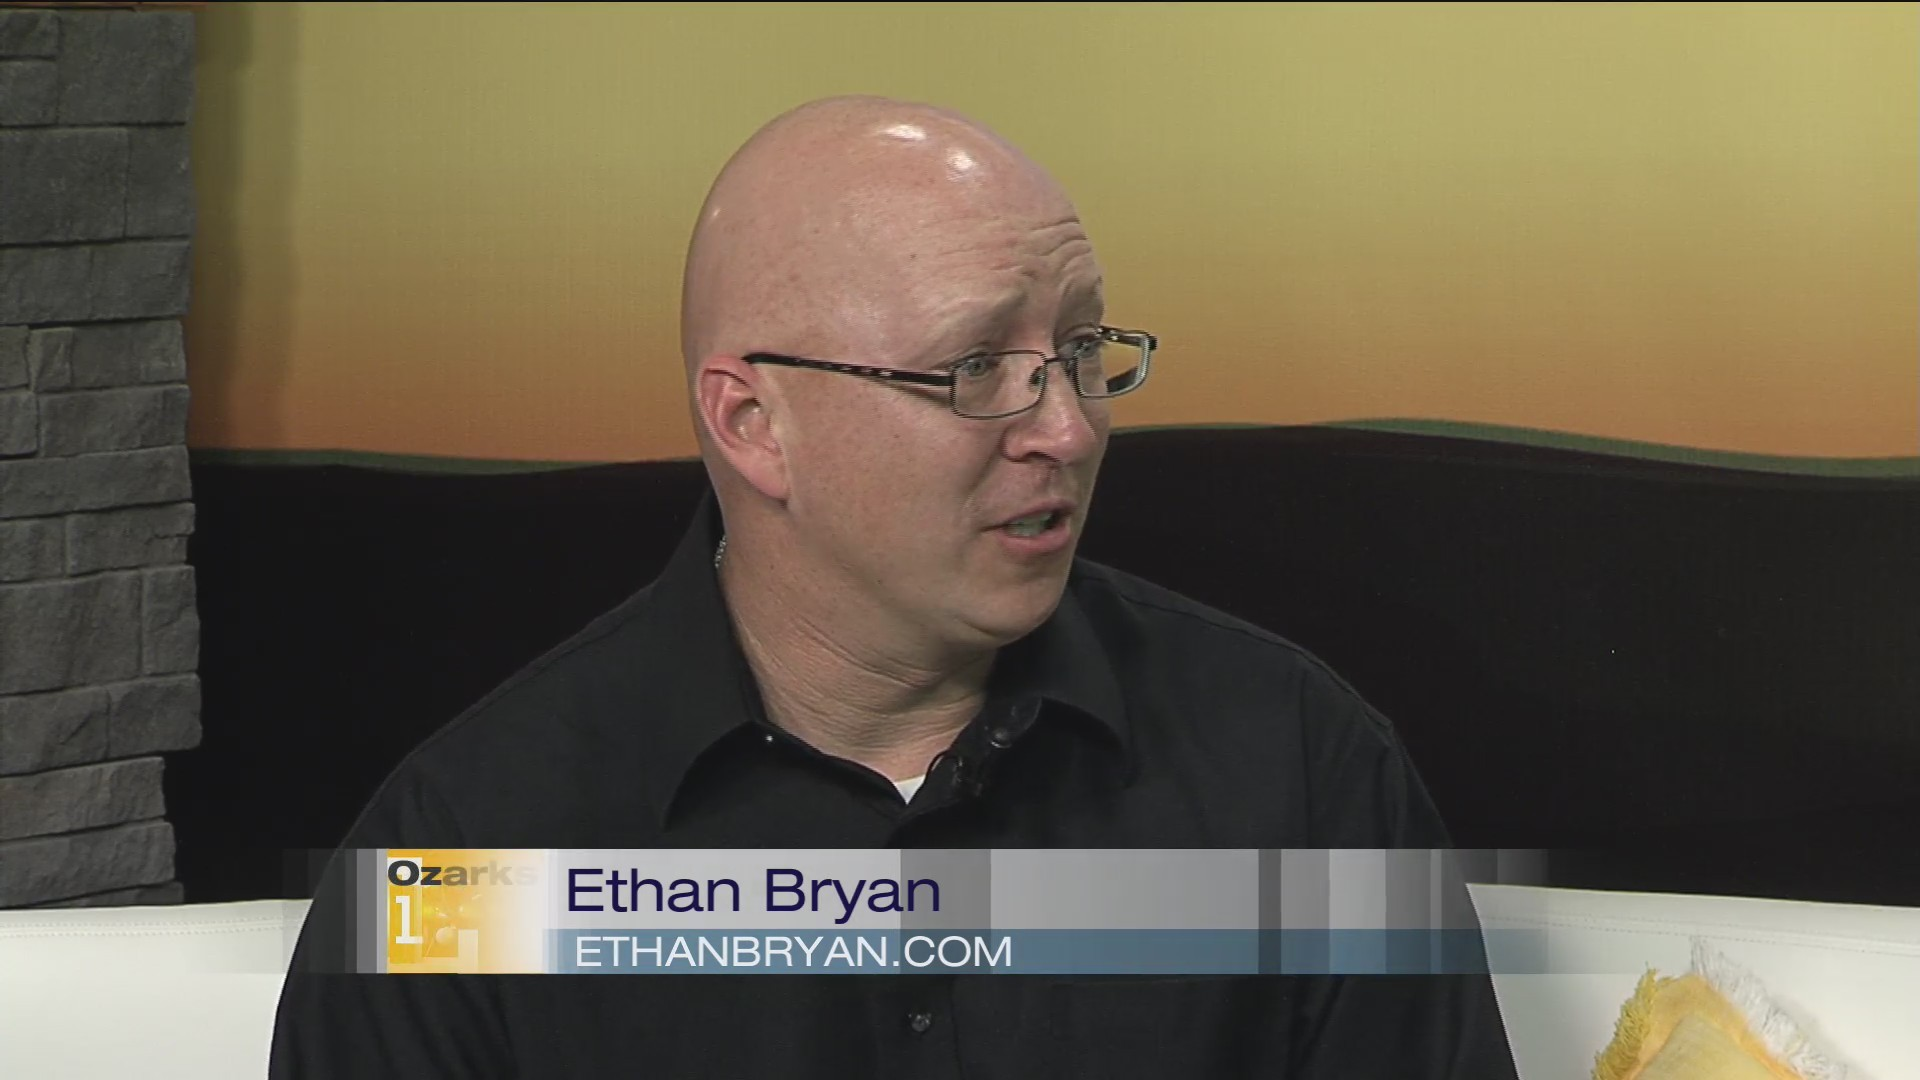 Ethan Bryan on Ozarks Live!  - 4/19/19